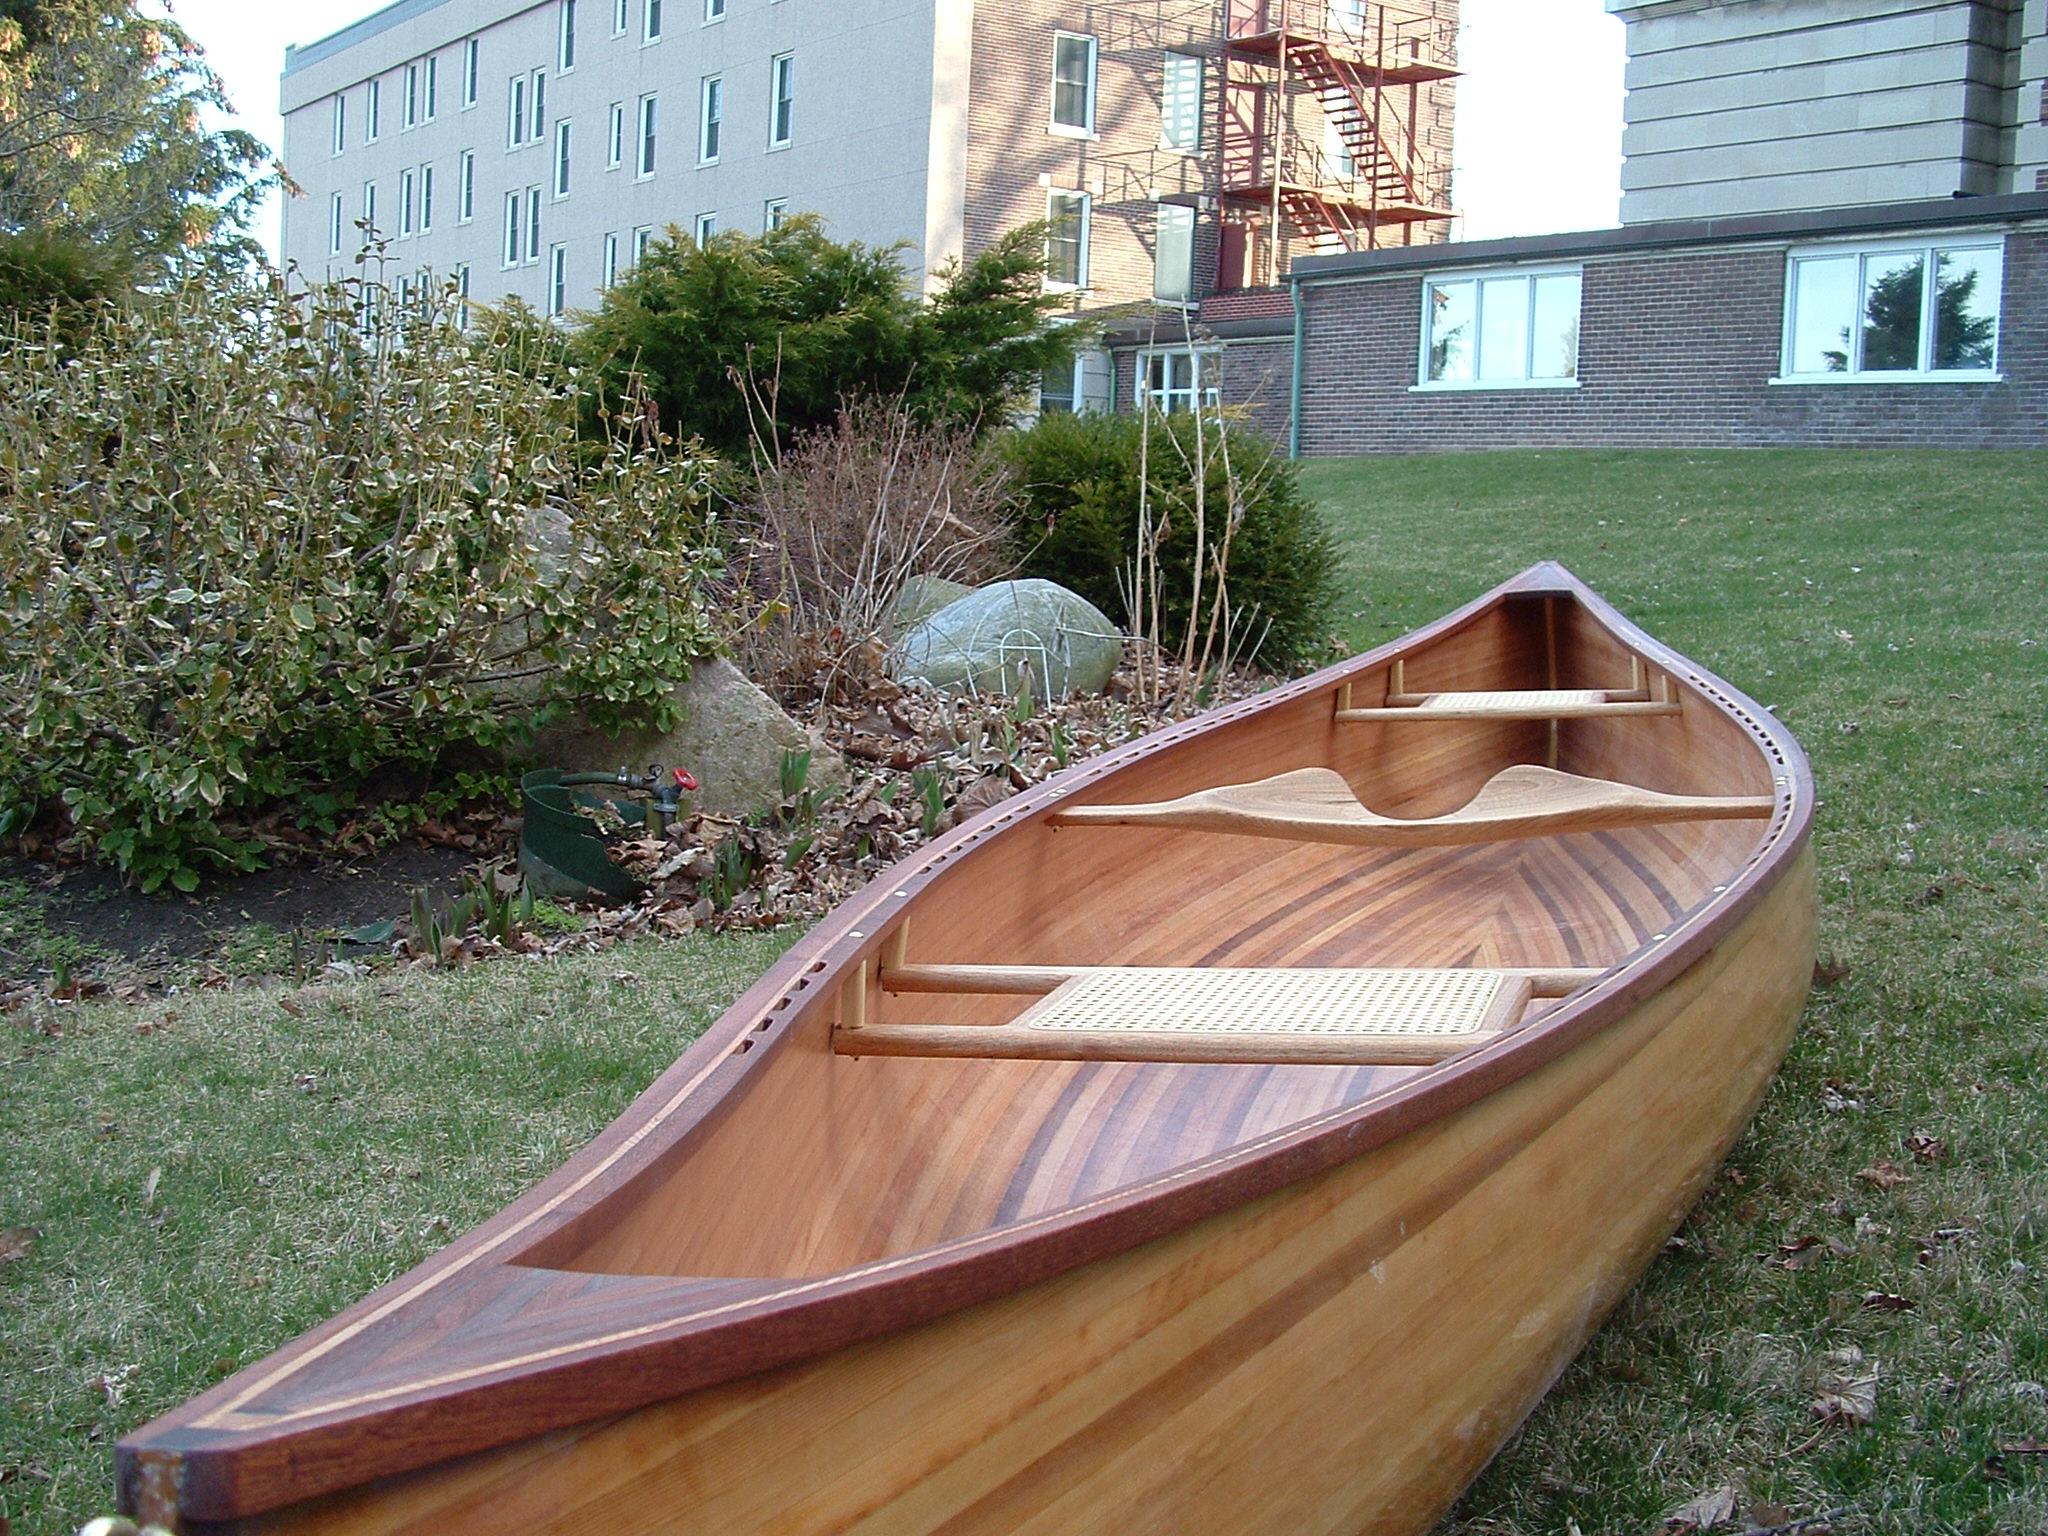 Canoe 403.jpg